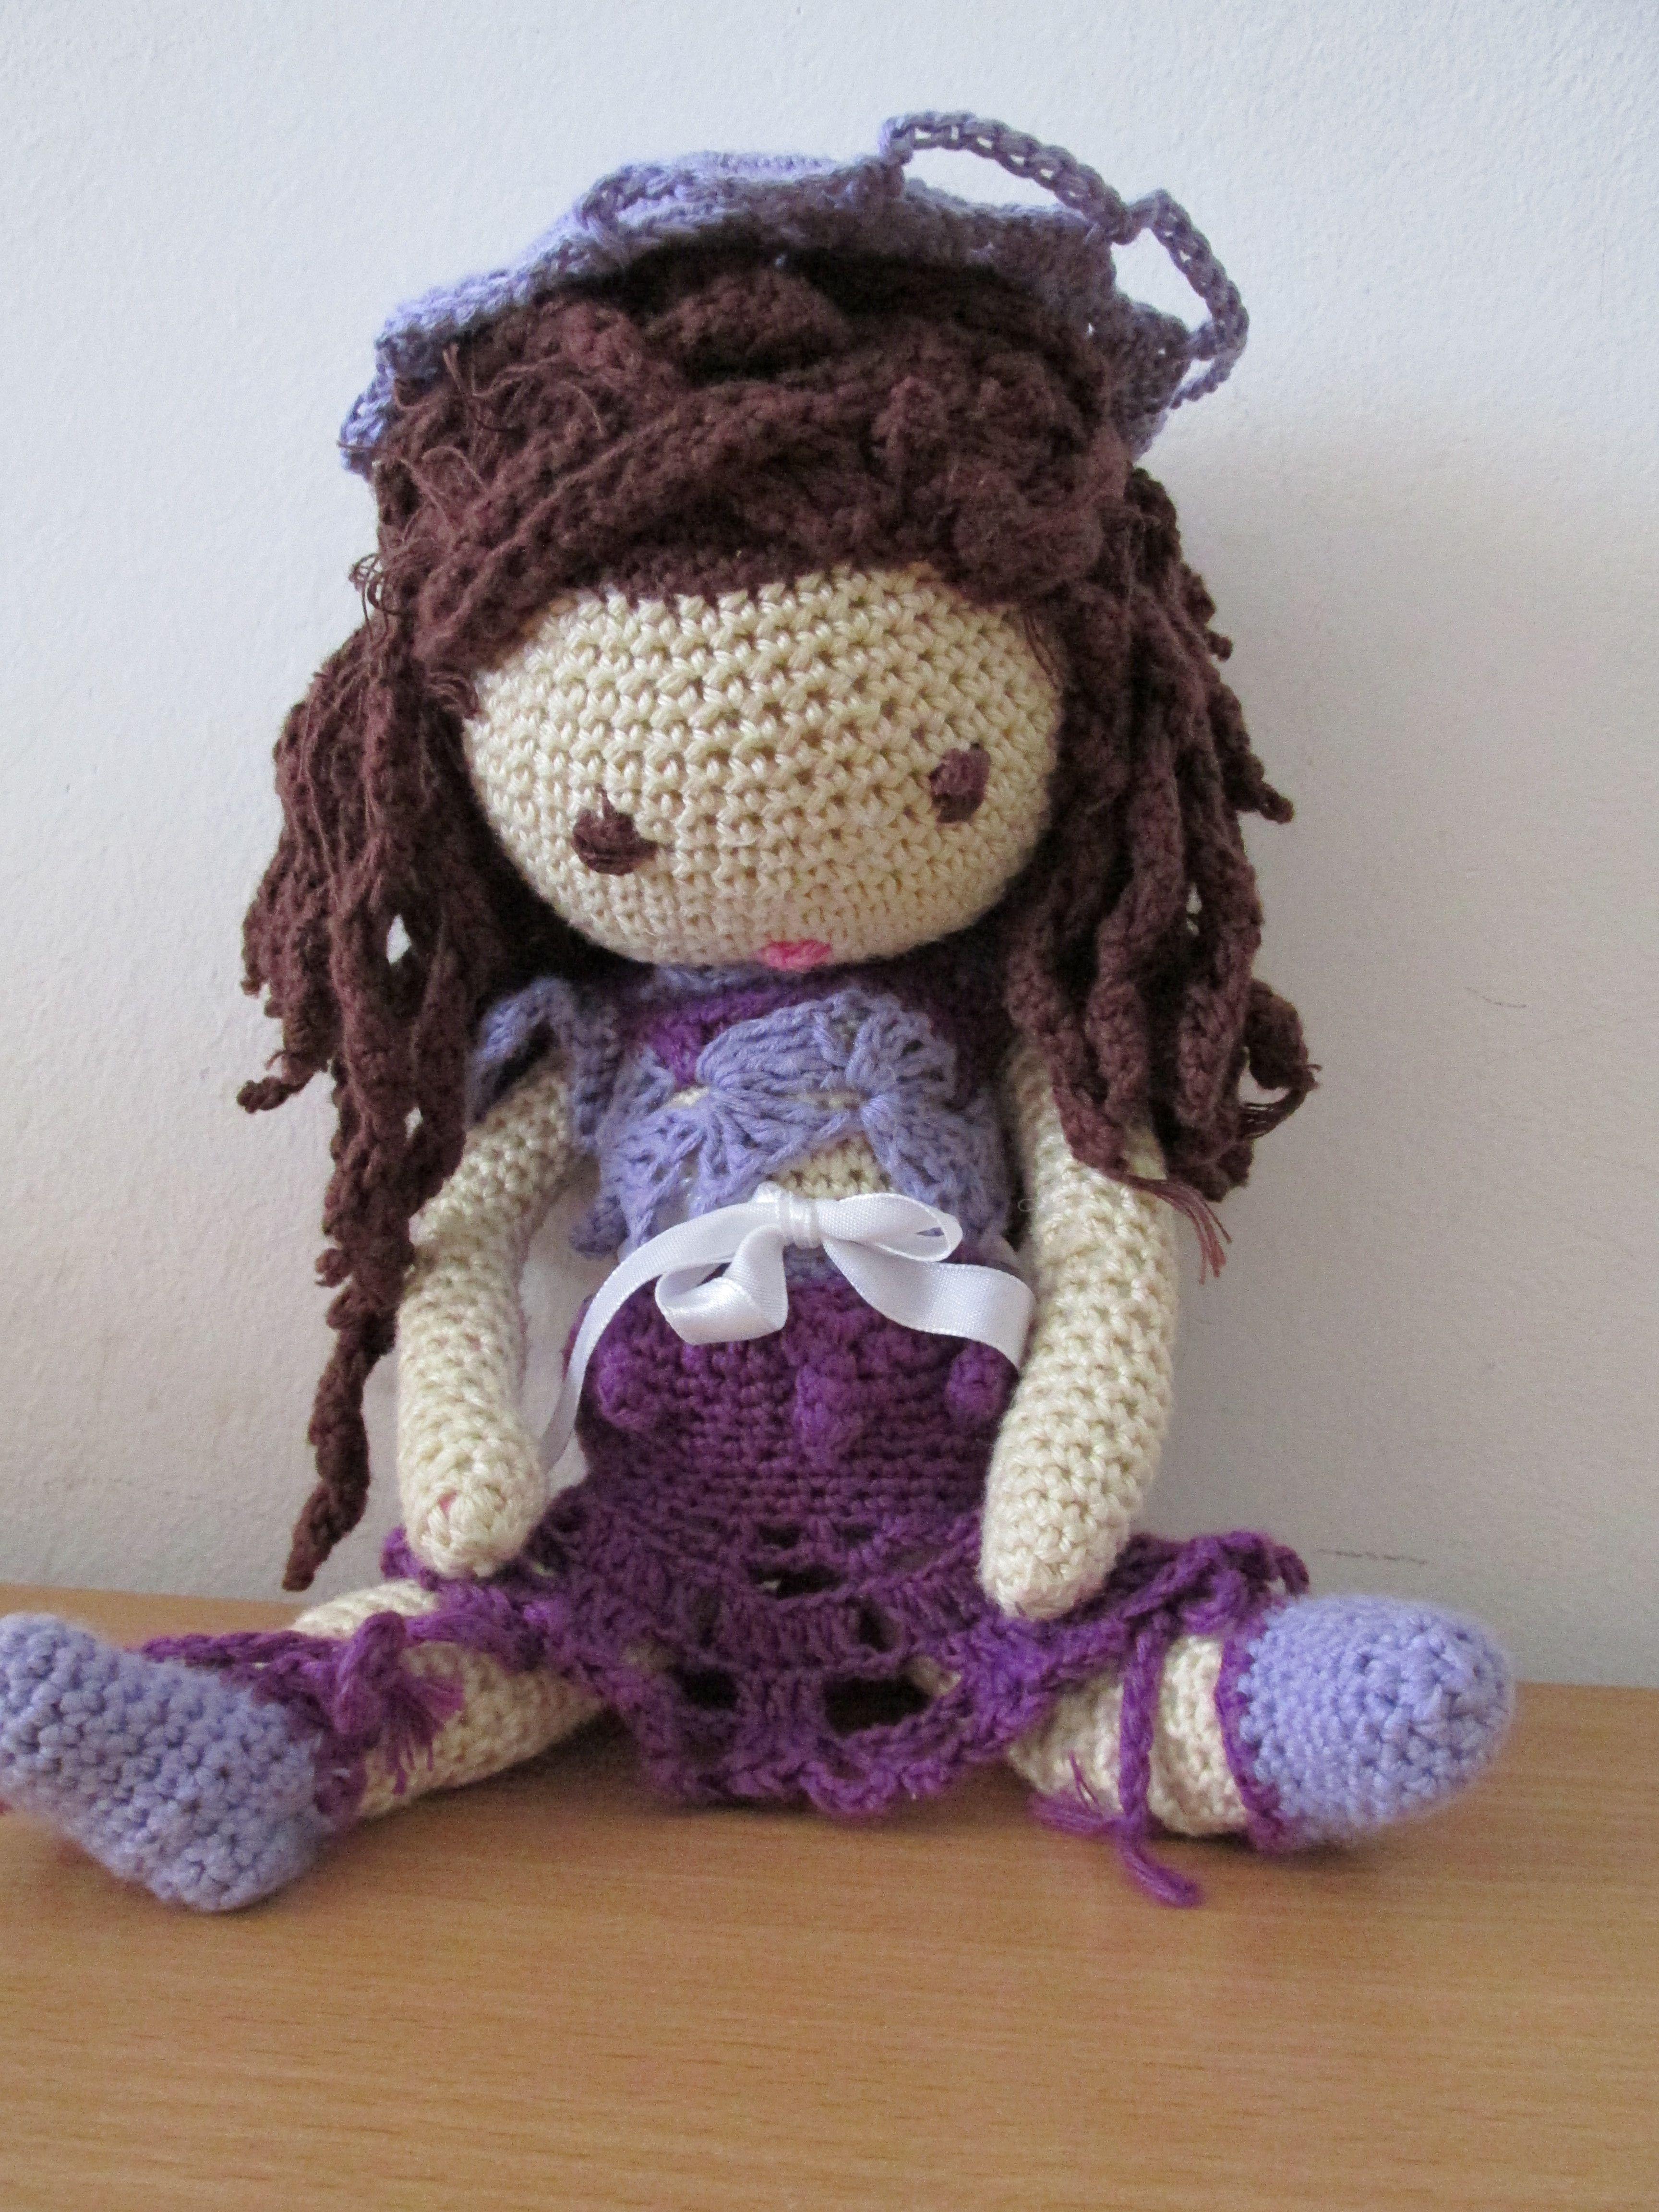 My second daughter's favourit doll (Pupinett from I. Kessedjian)